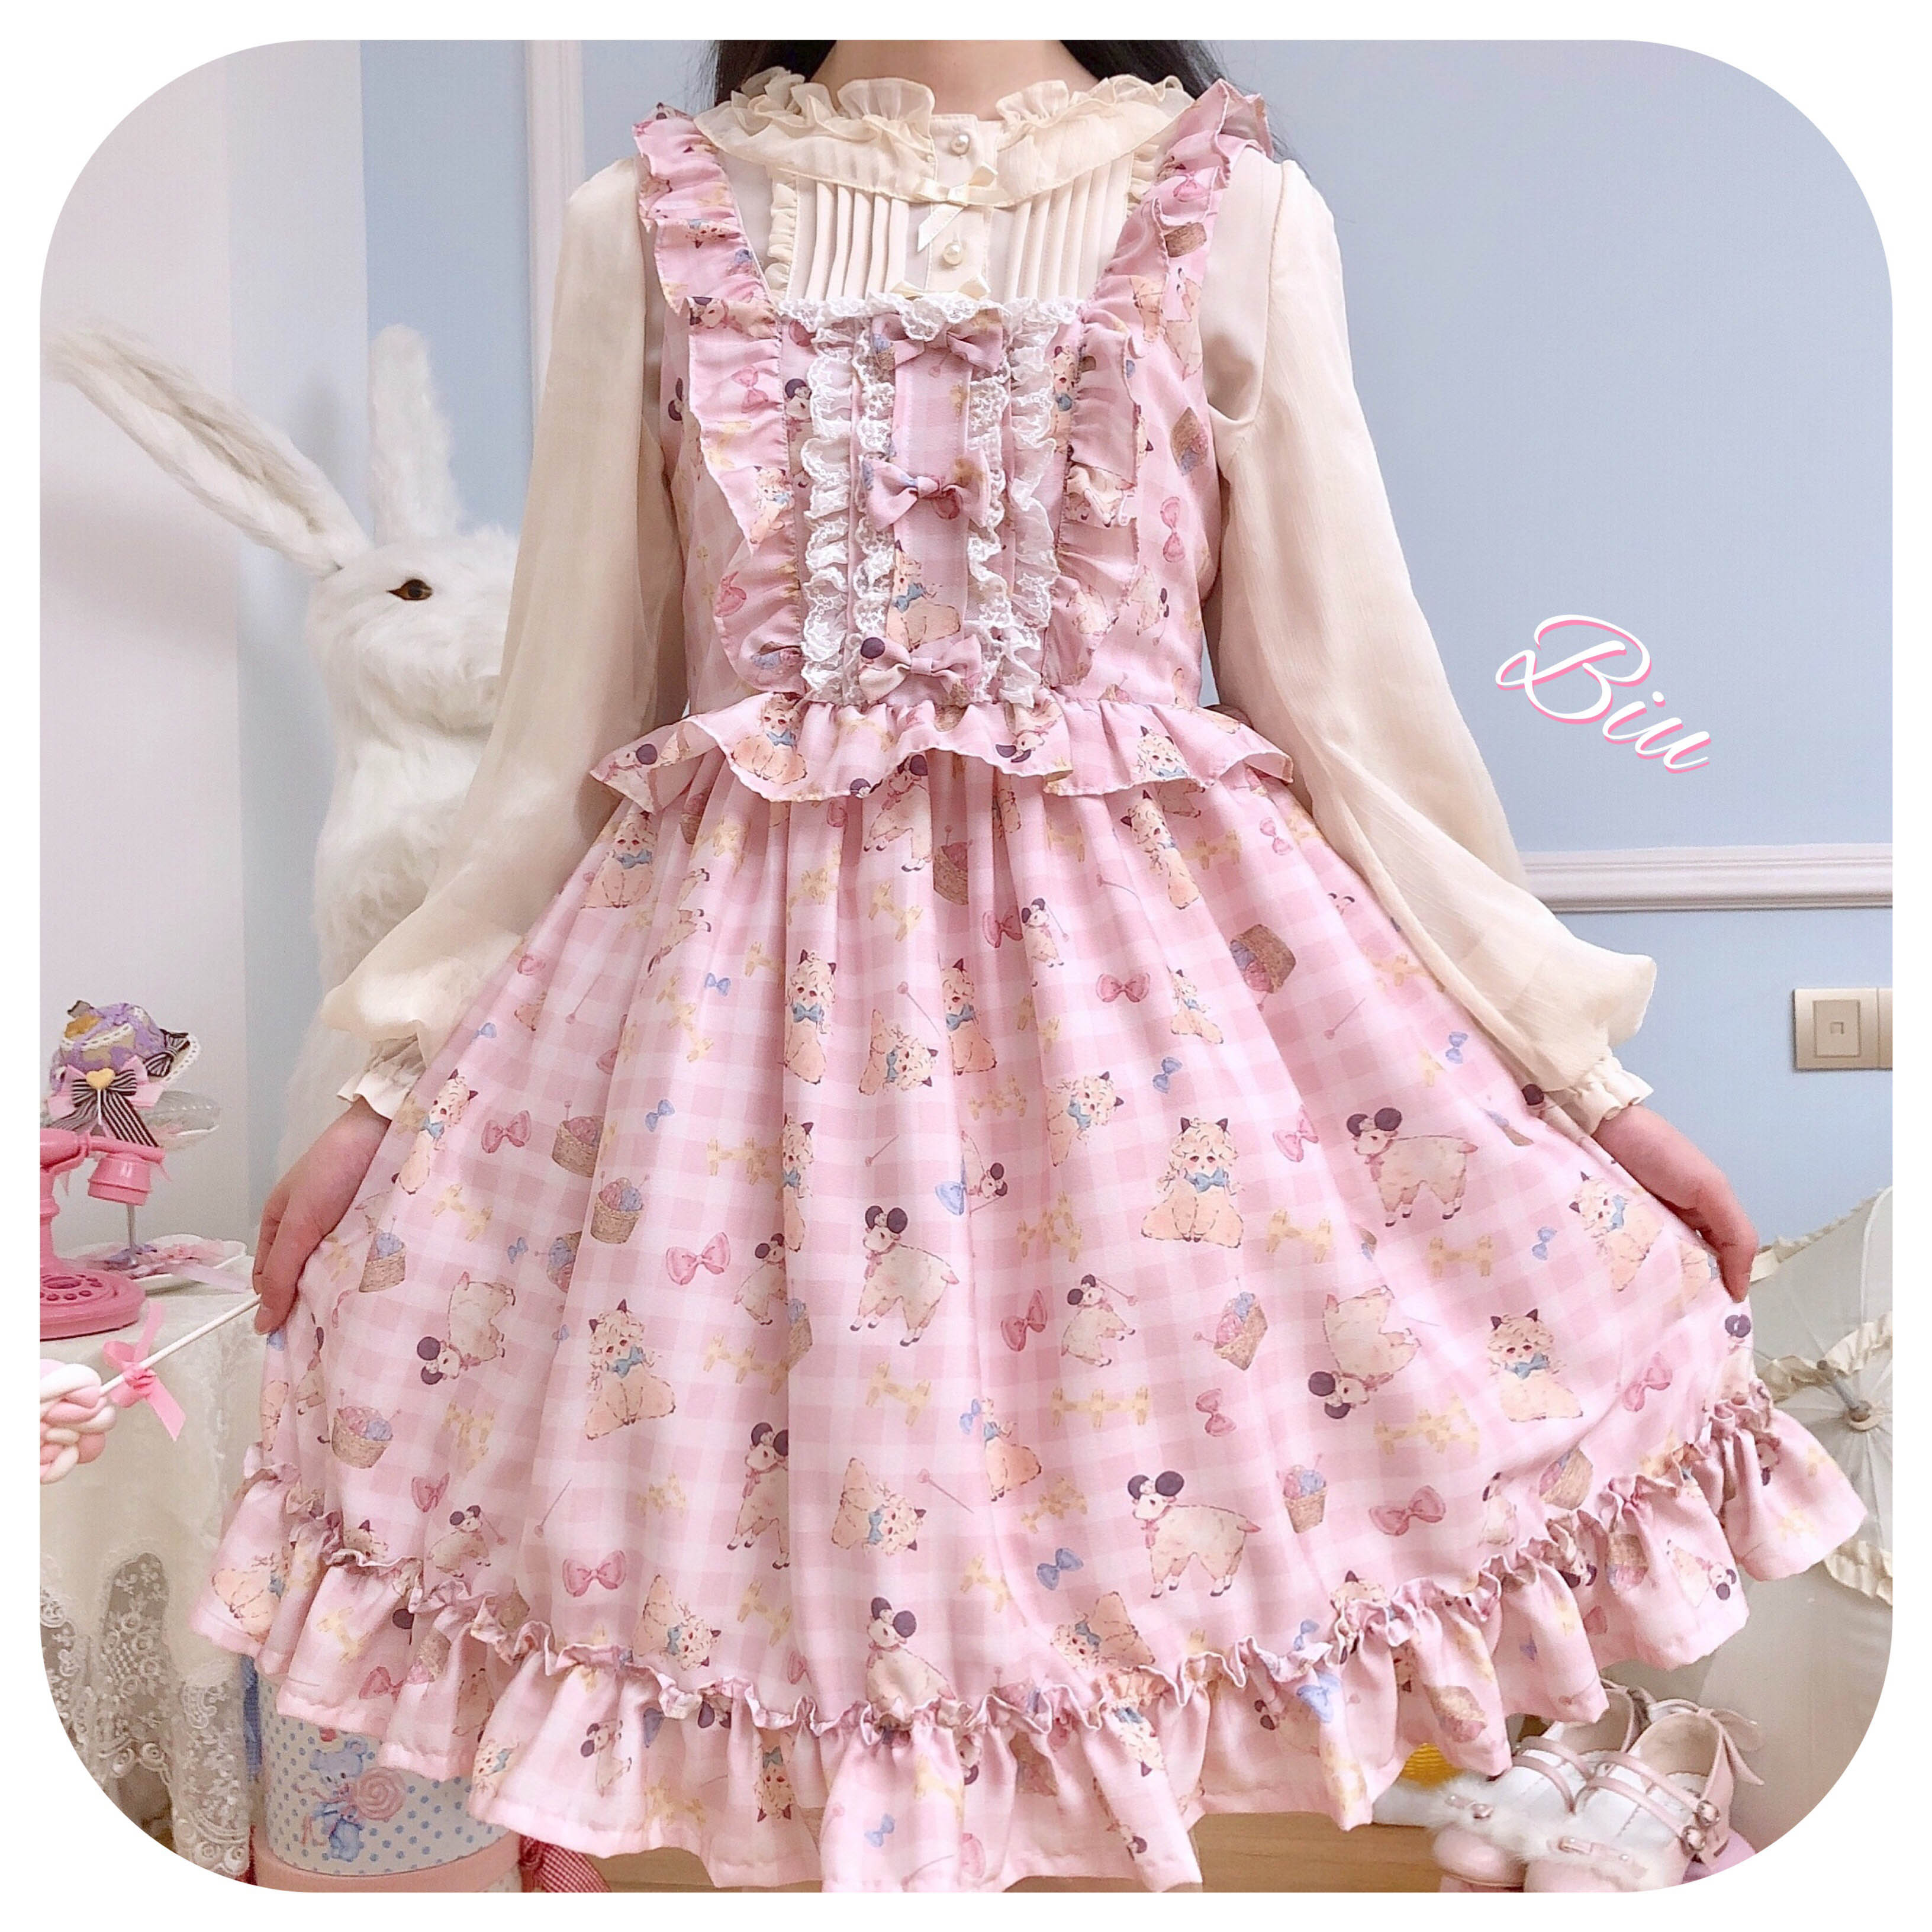 Starlight original ~ cotton ball sheep jsk ~ Cream Strawberry BAABAA Lolita Lolita Dress available